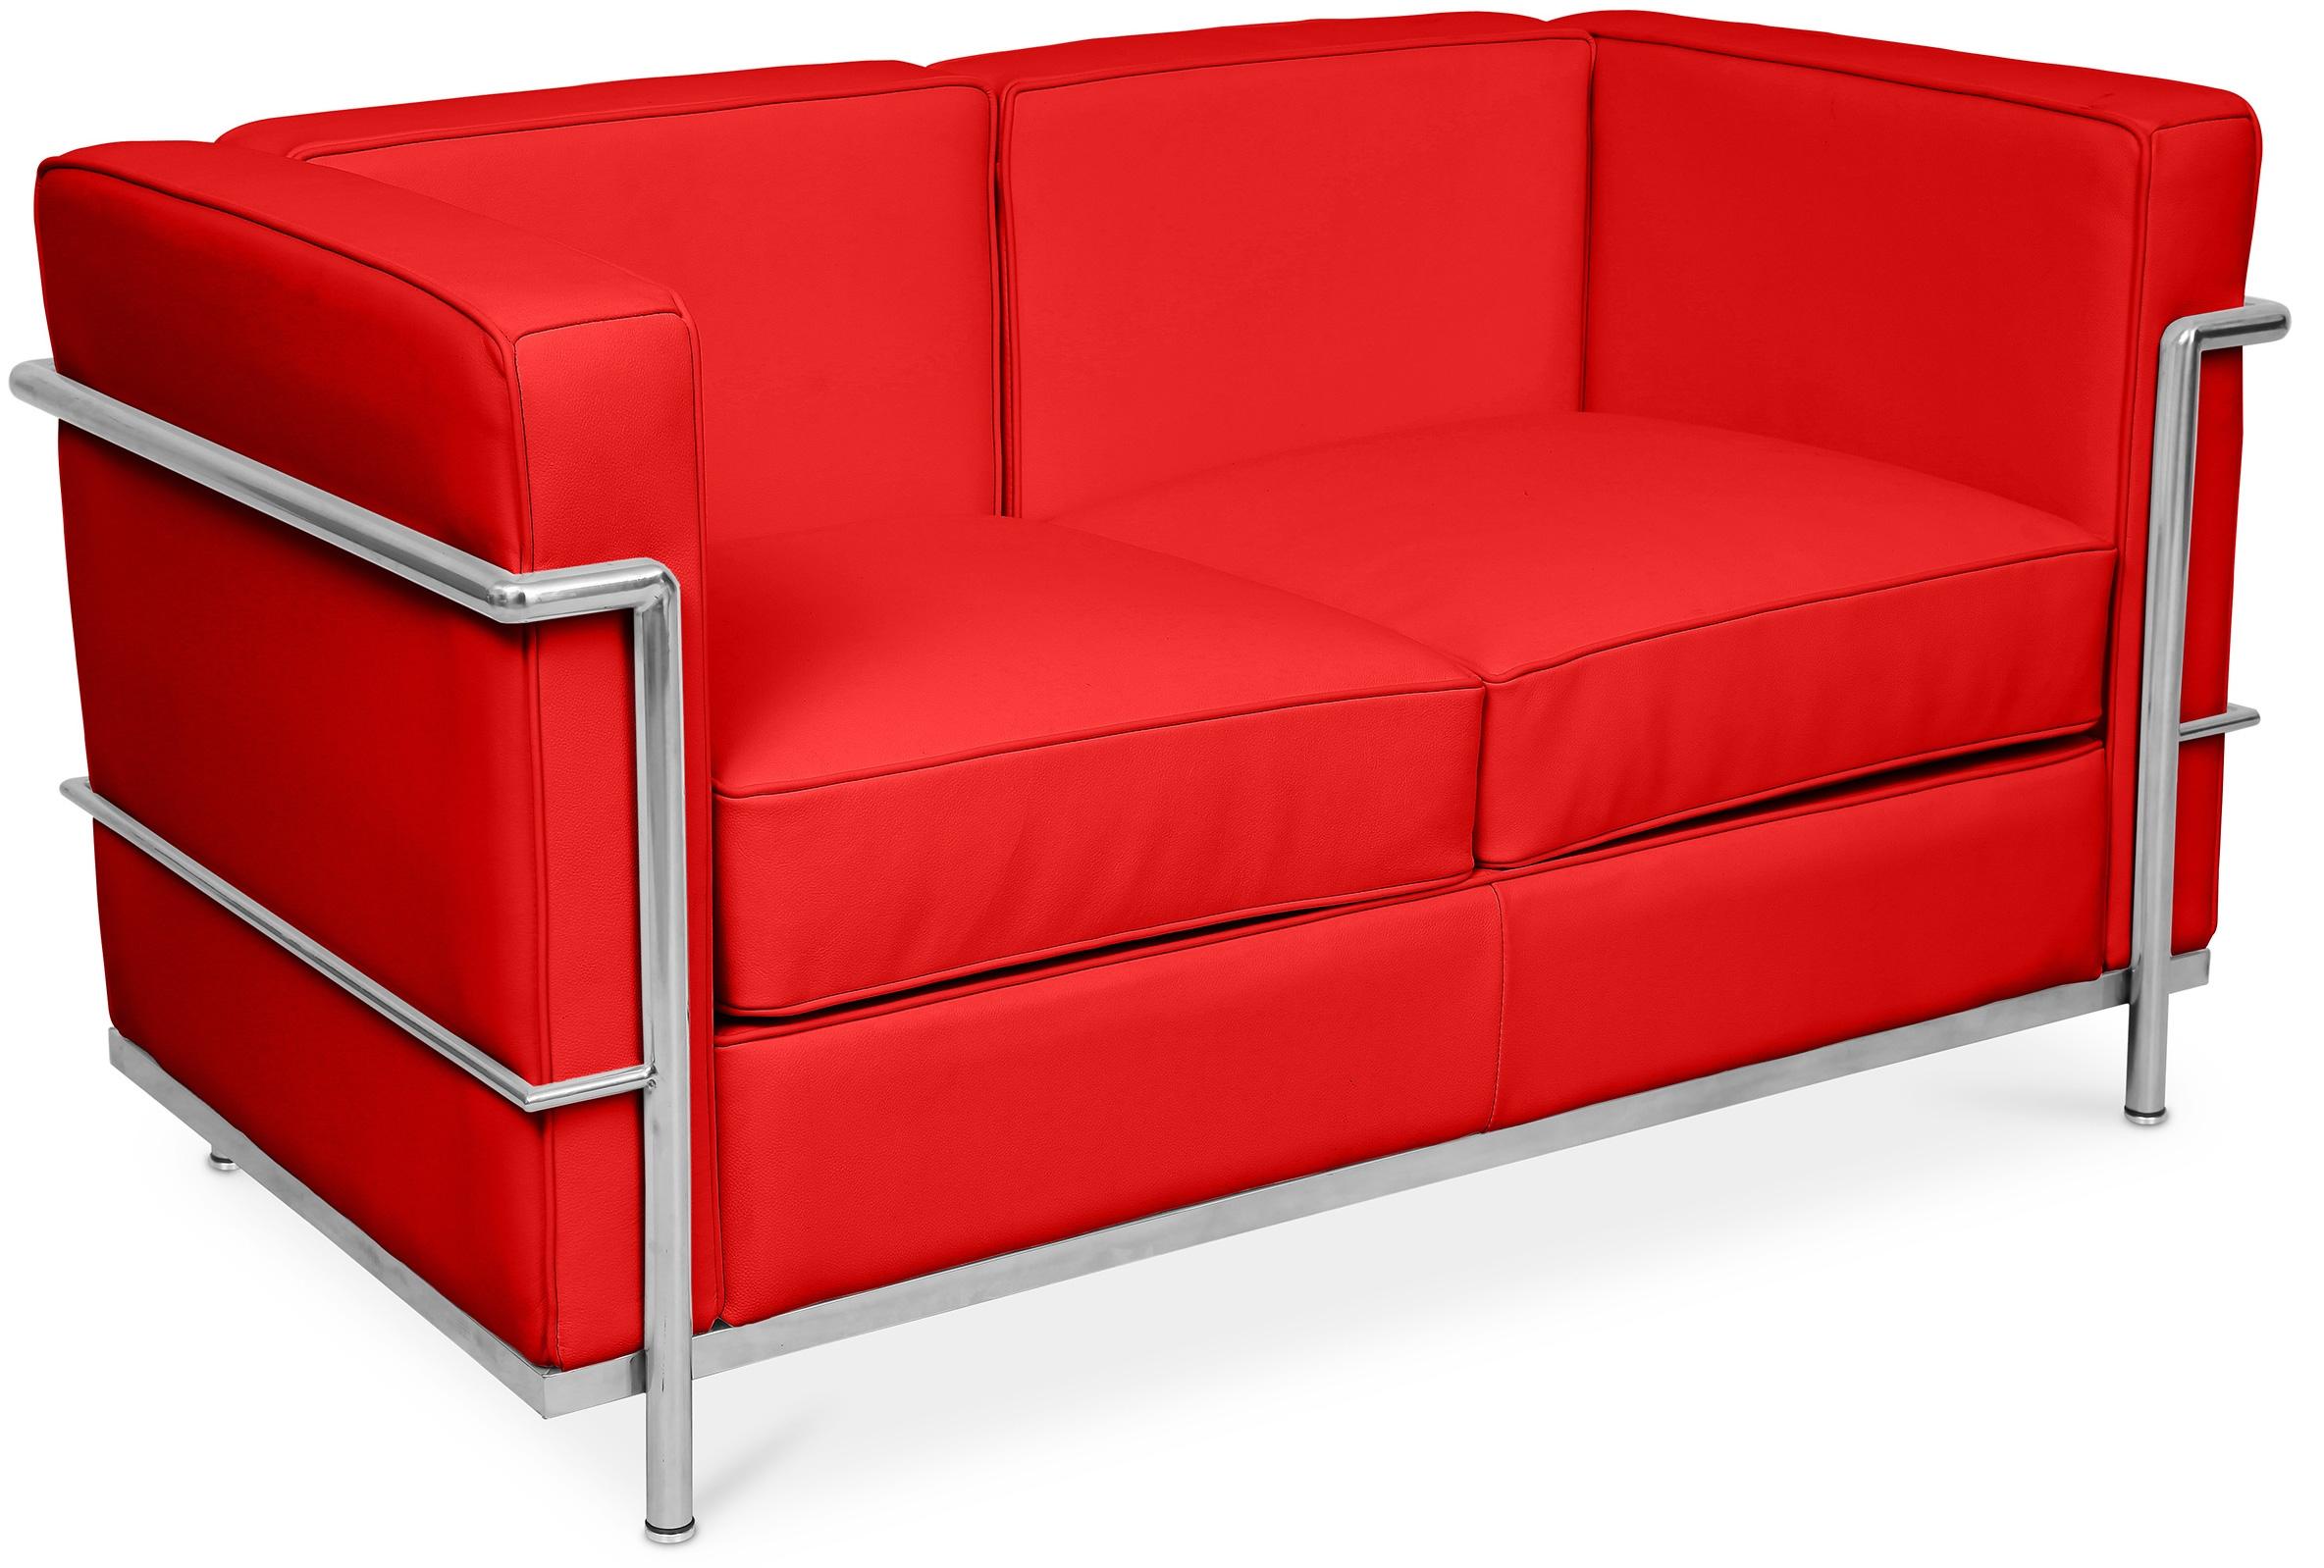 canap cuir rouge 2 places l 132 inspir lc2. Black Bedroom Furniture Sets. Home Design Ideas